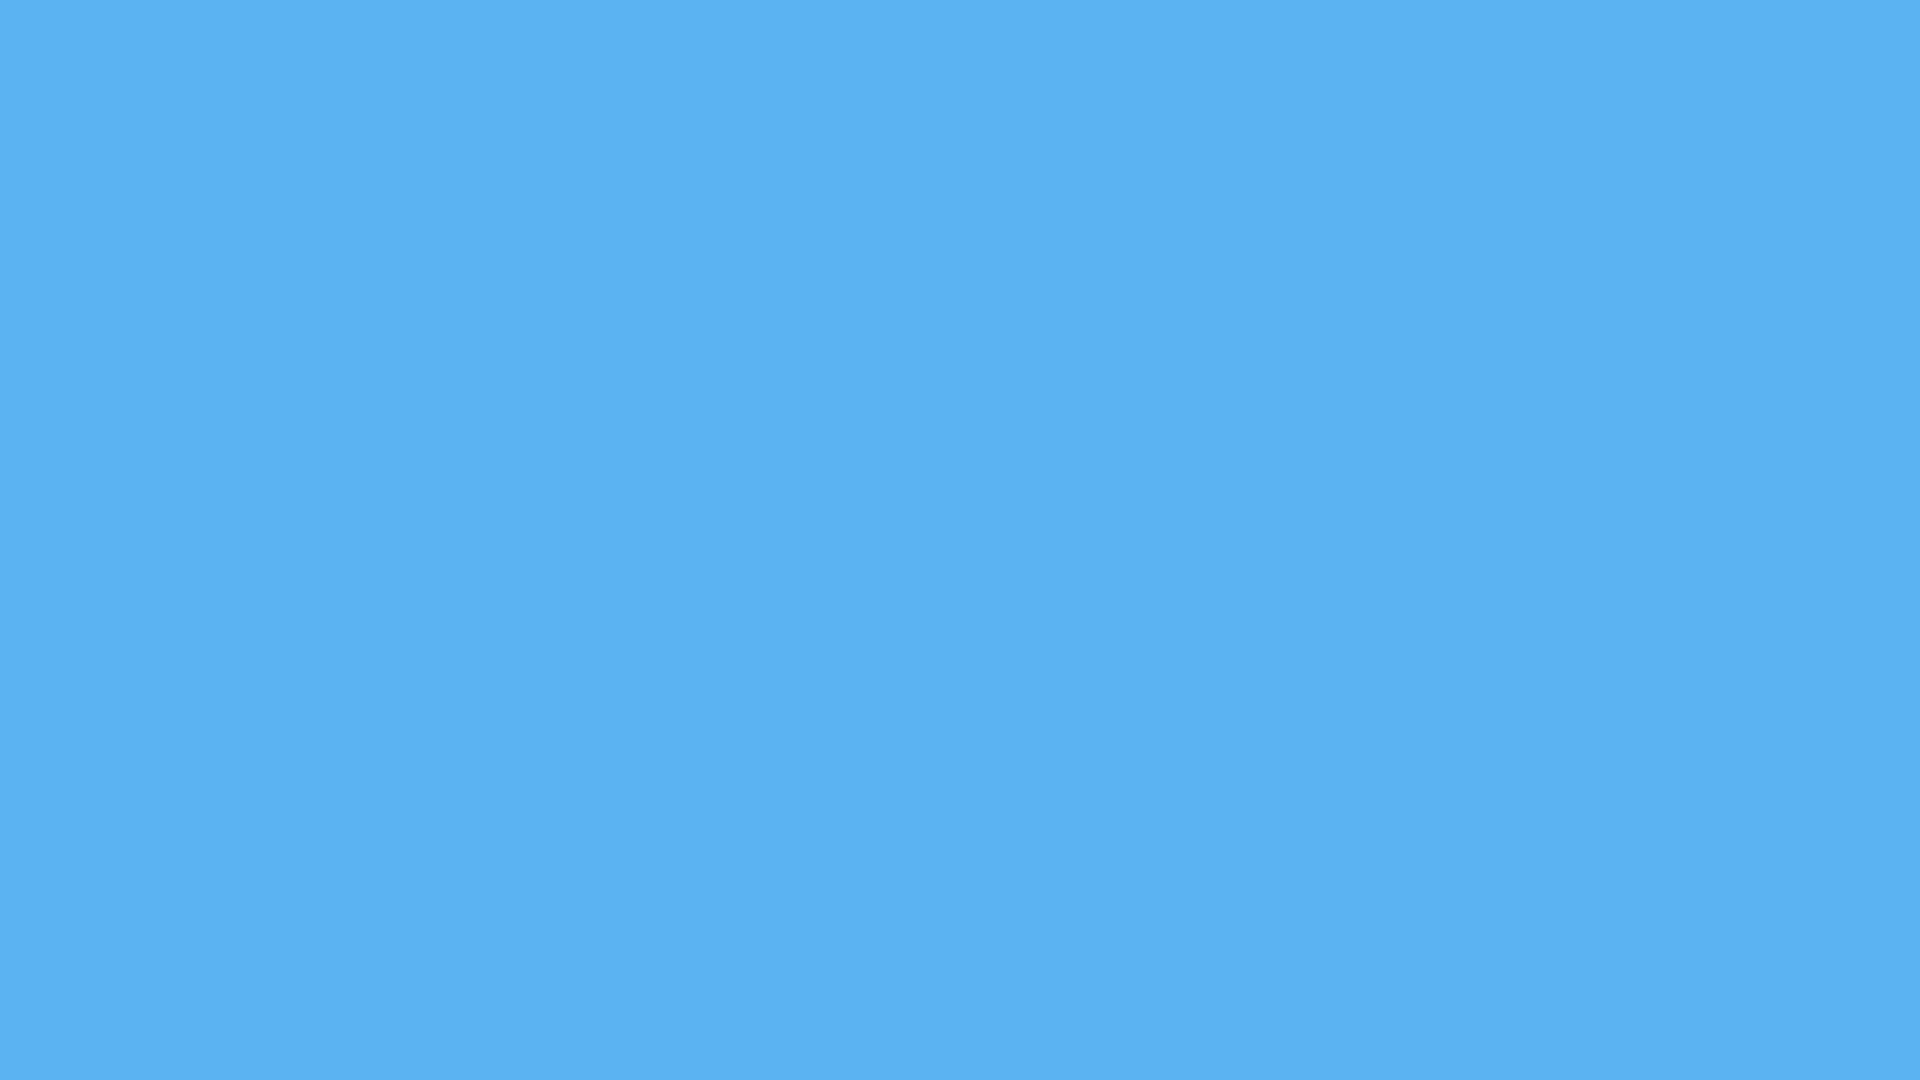 Fondo-azul-claro